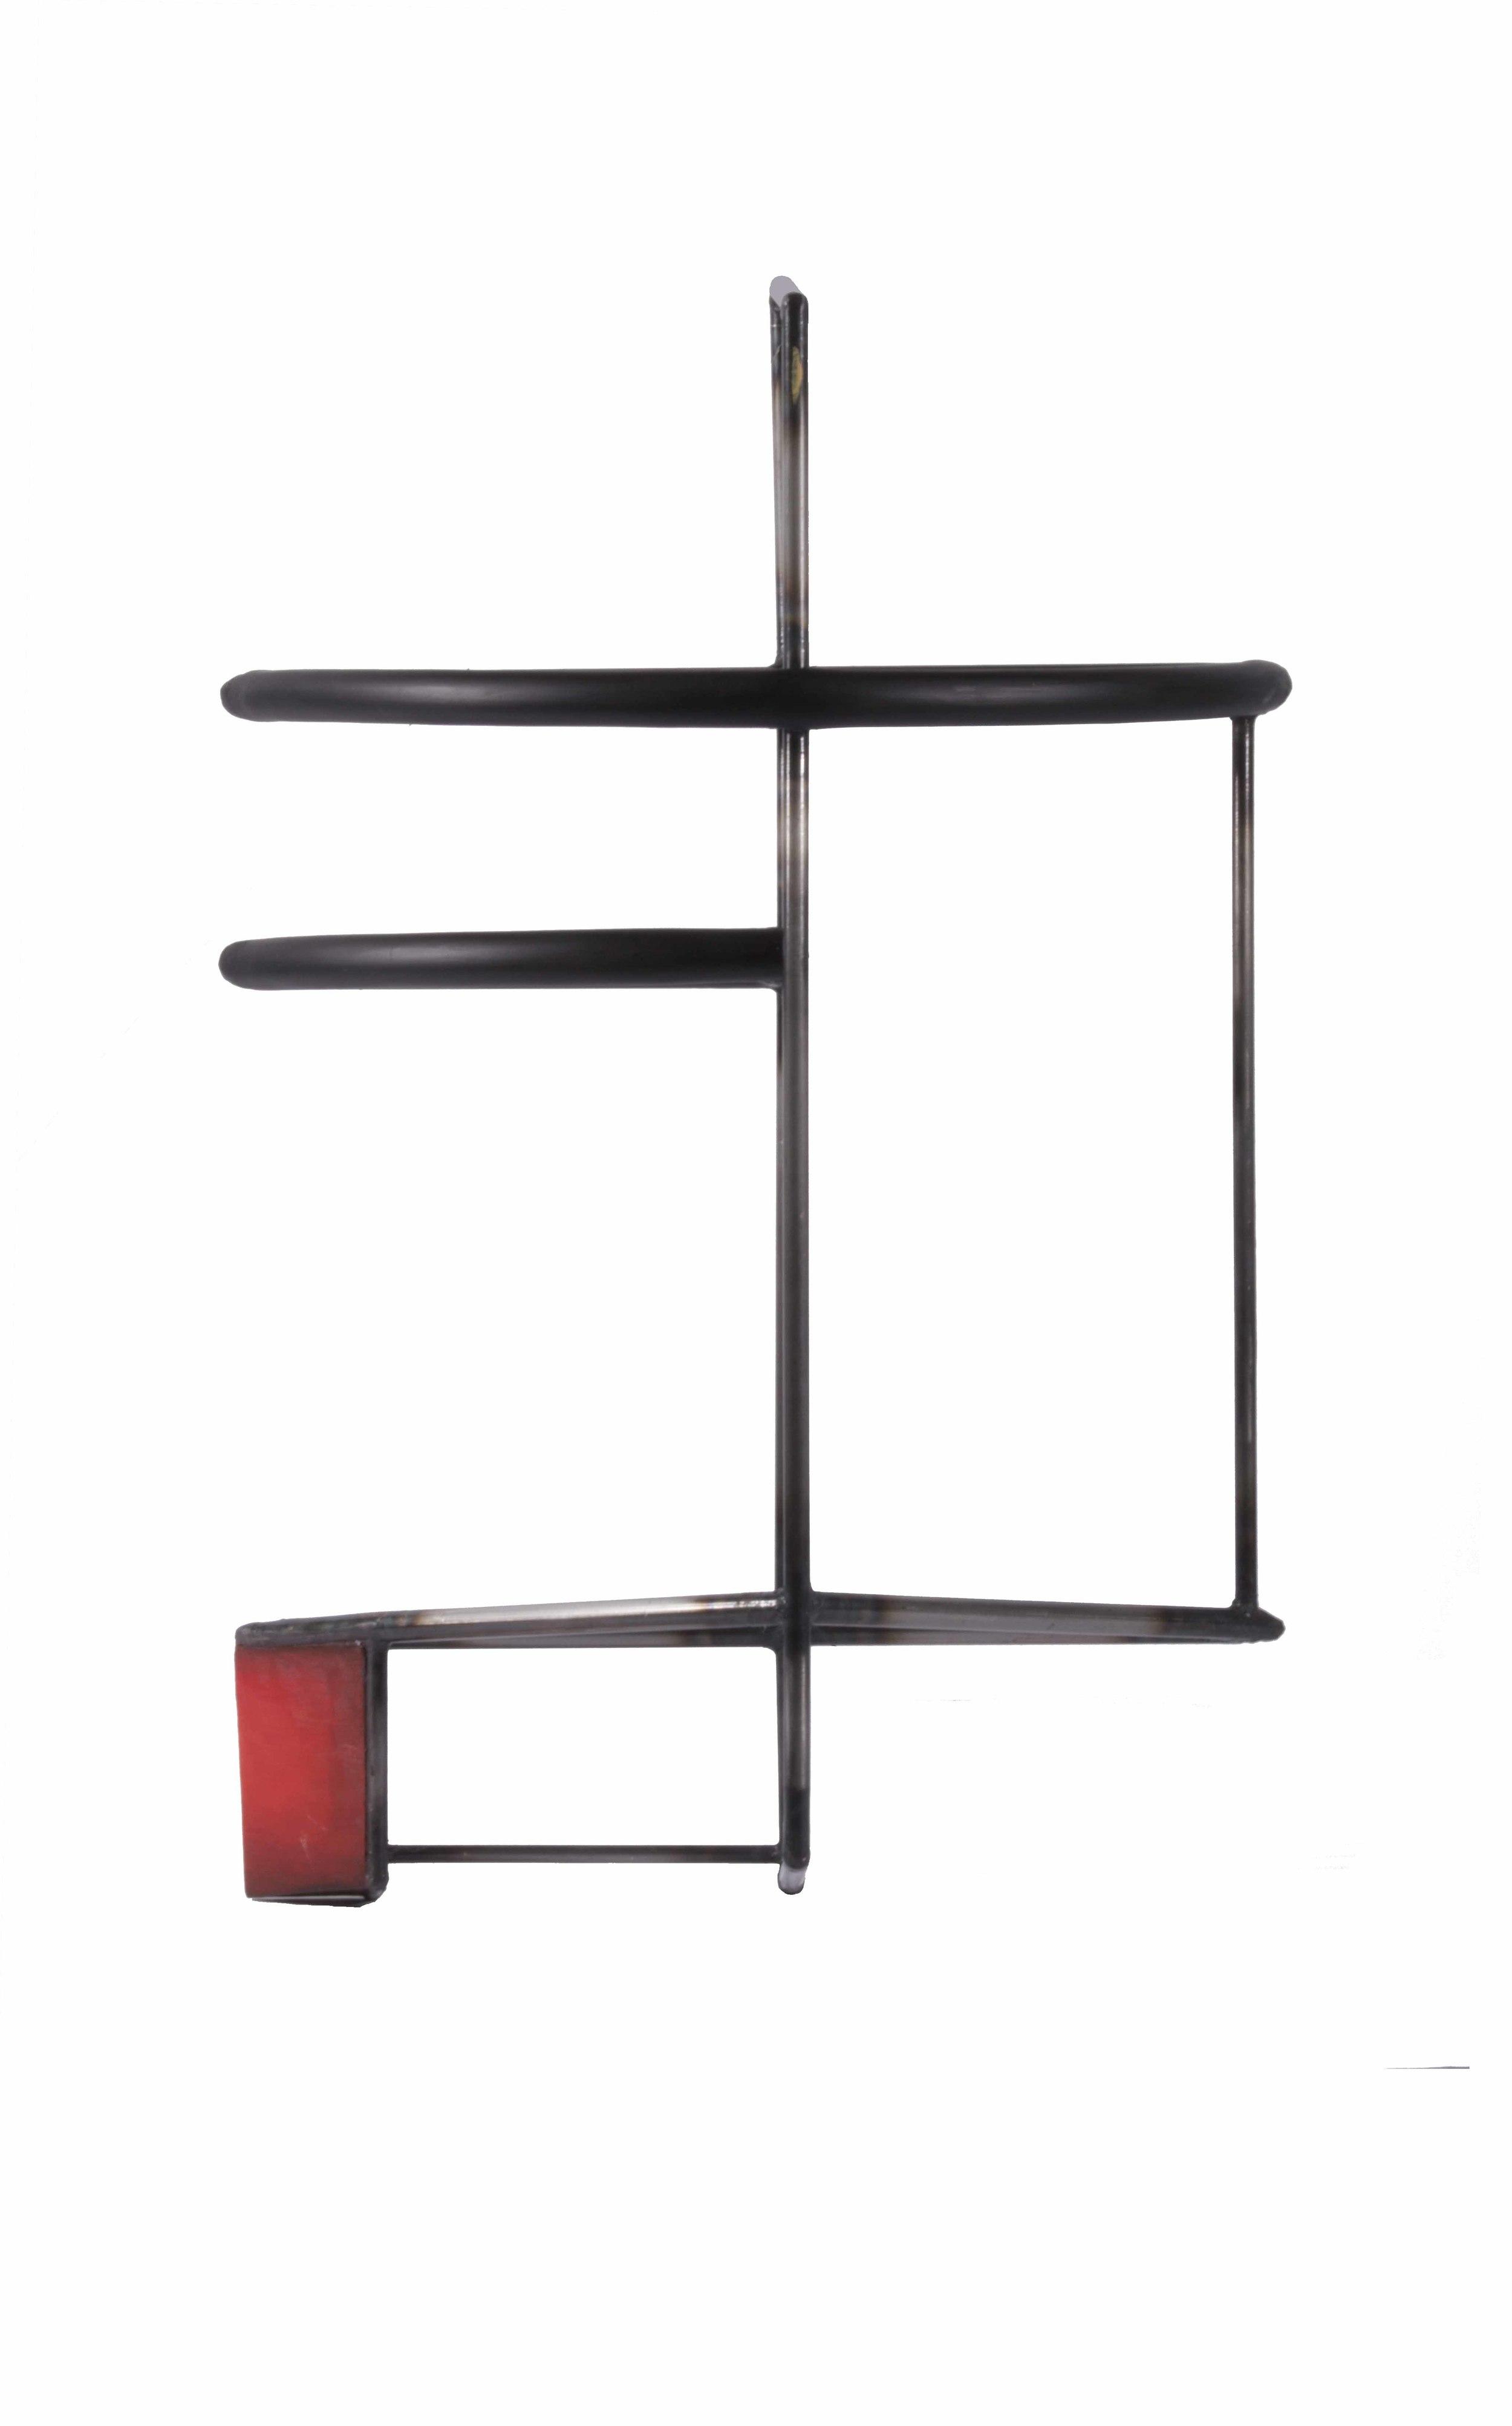 Mondrian Construction #7